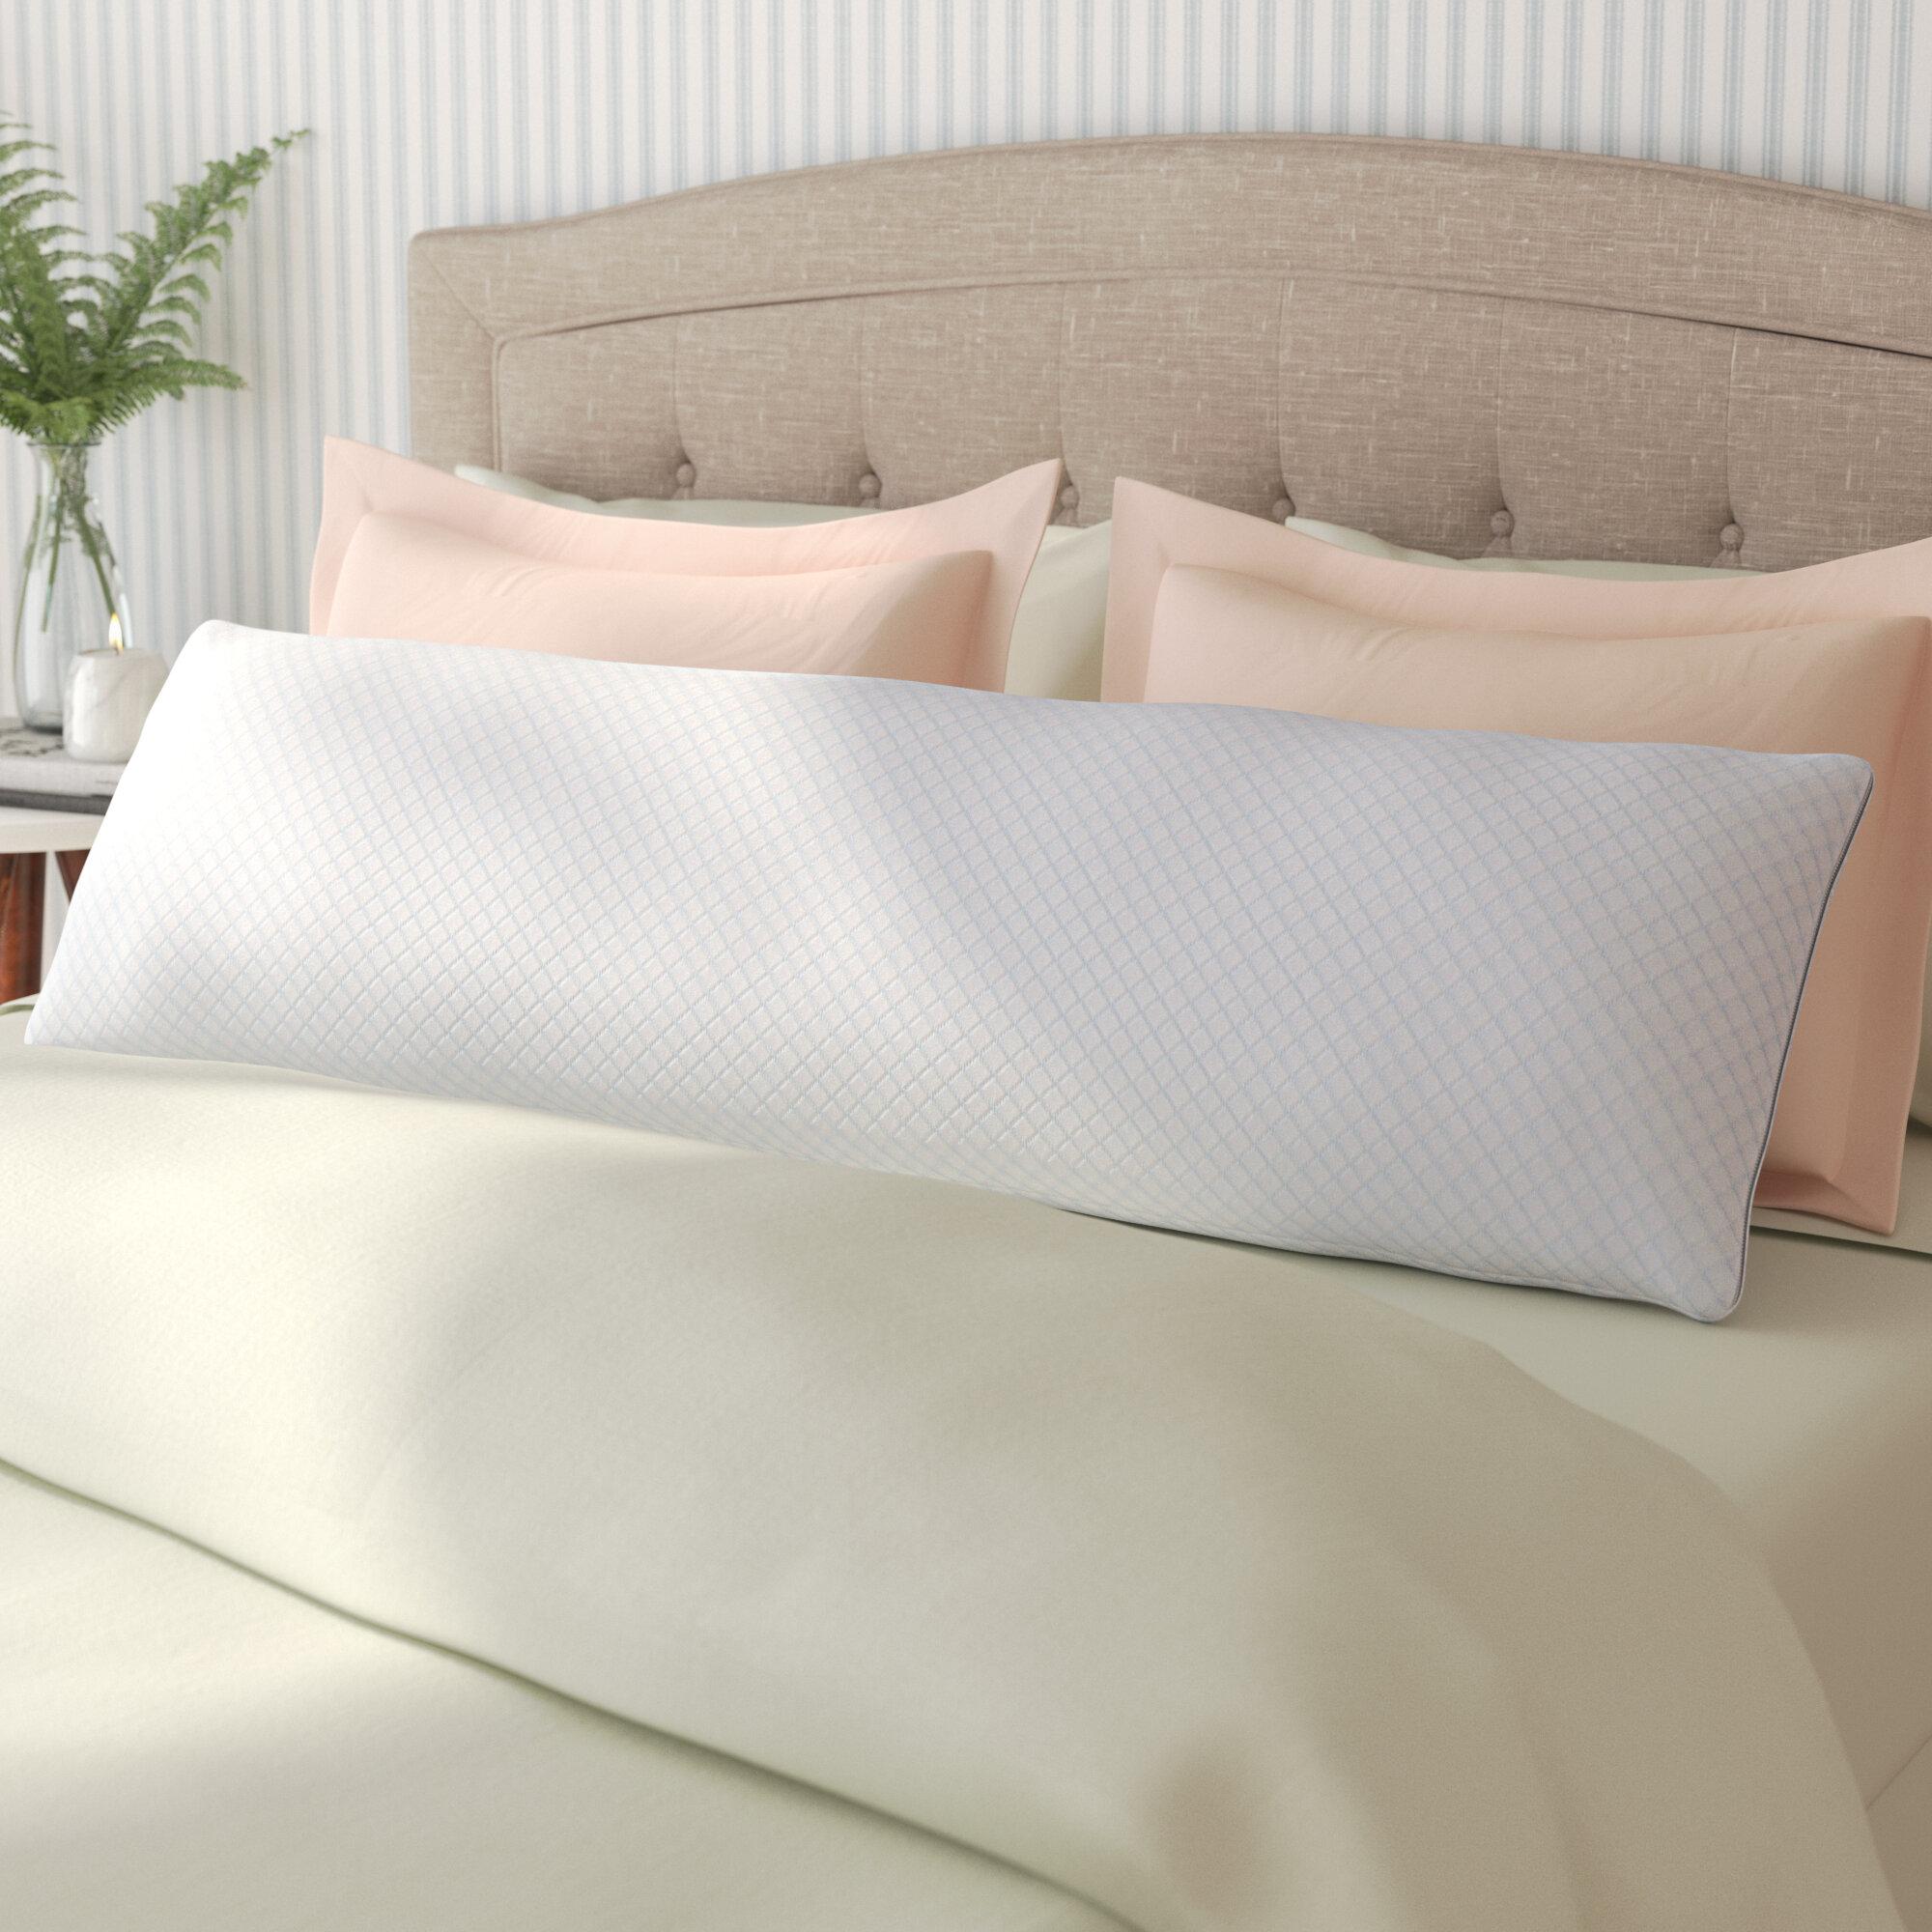 Alwyn Home Besaw Medium Comfort Cool Gel Memory Foam Standard